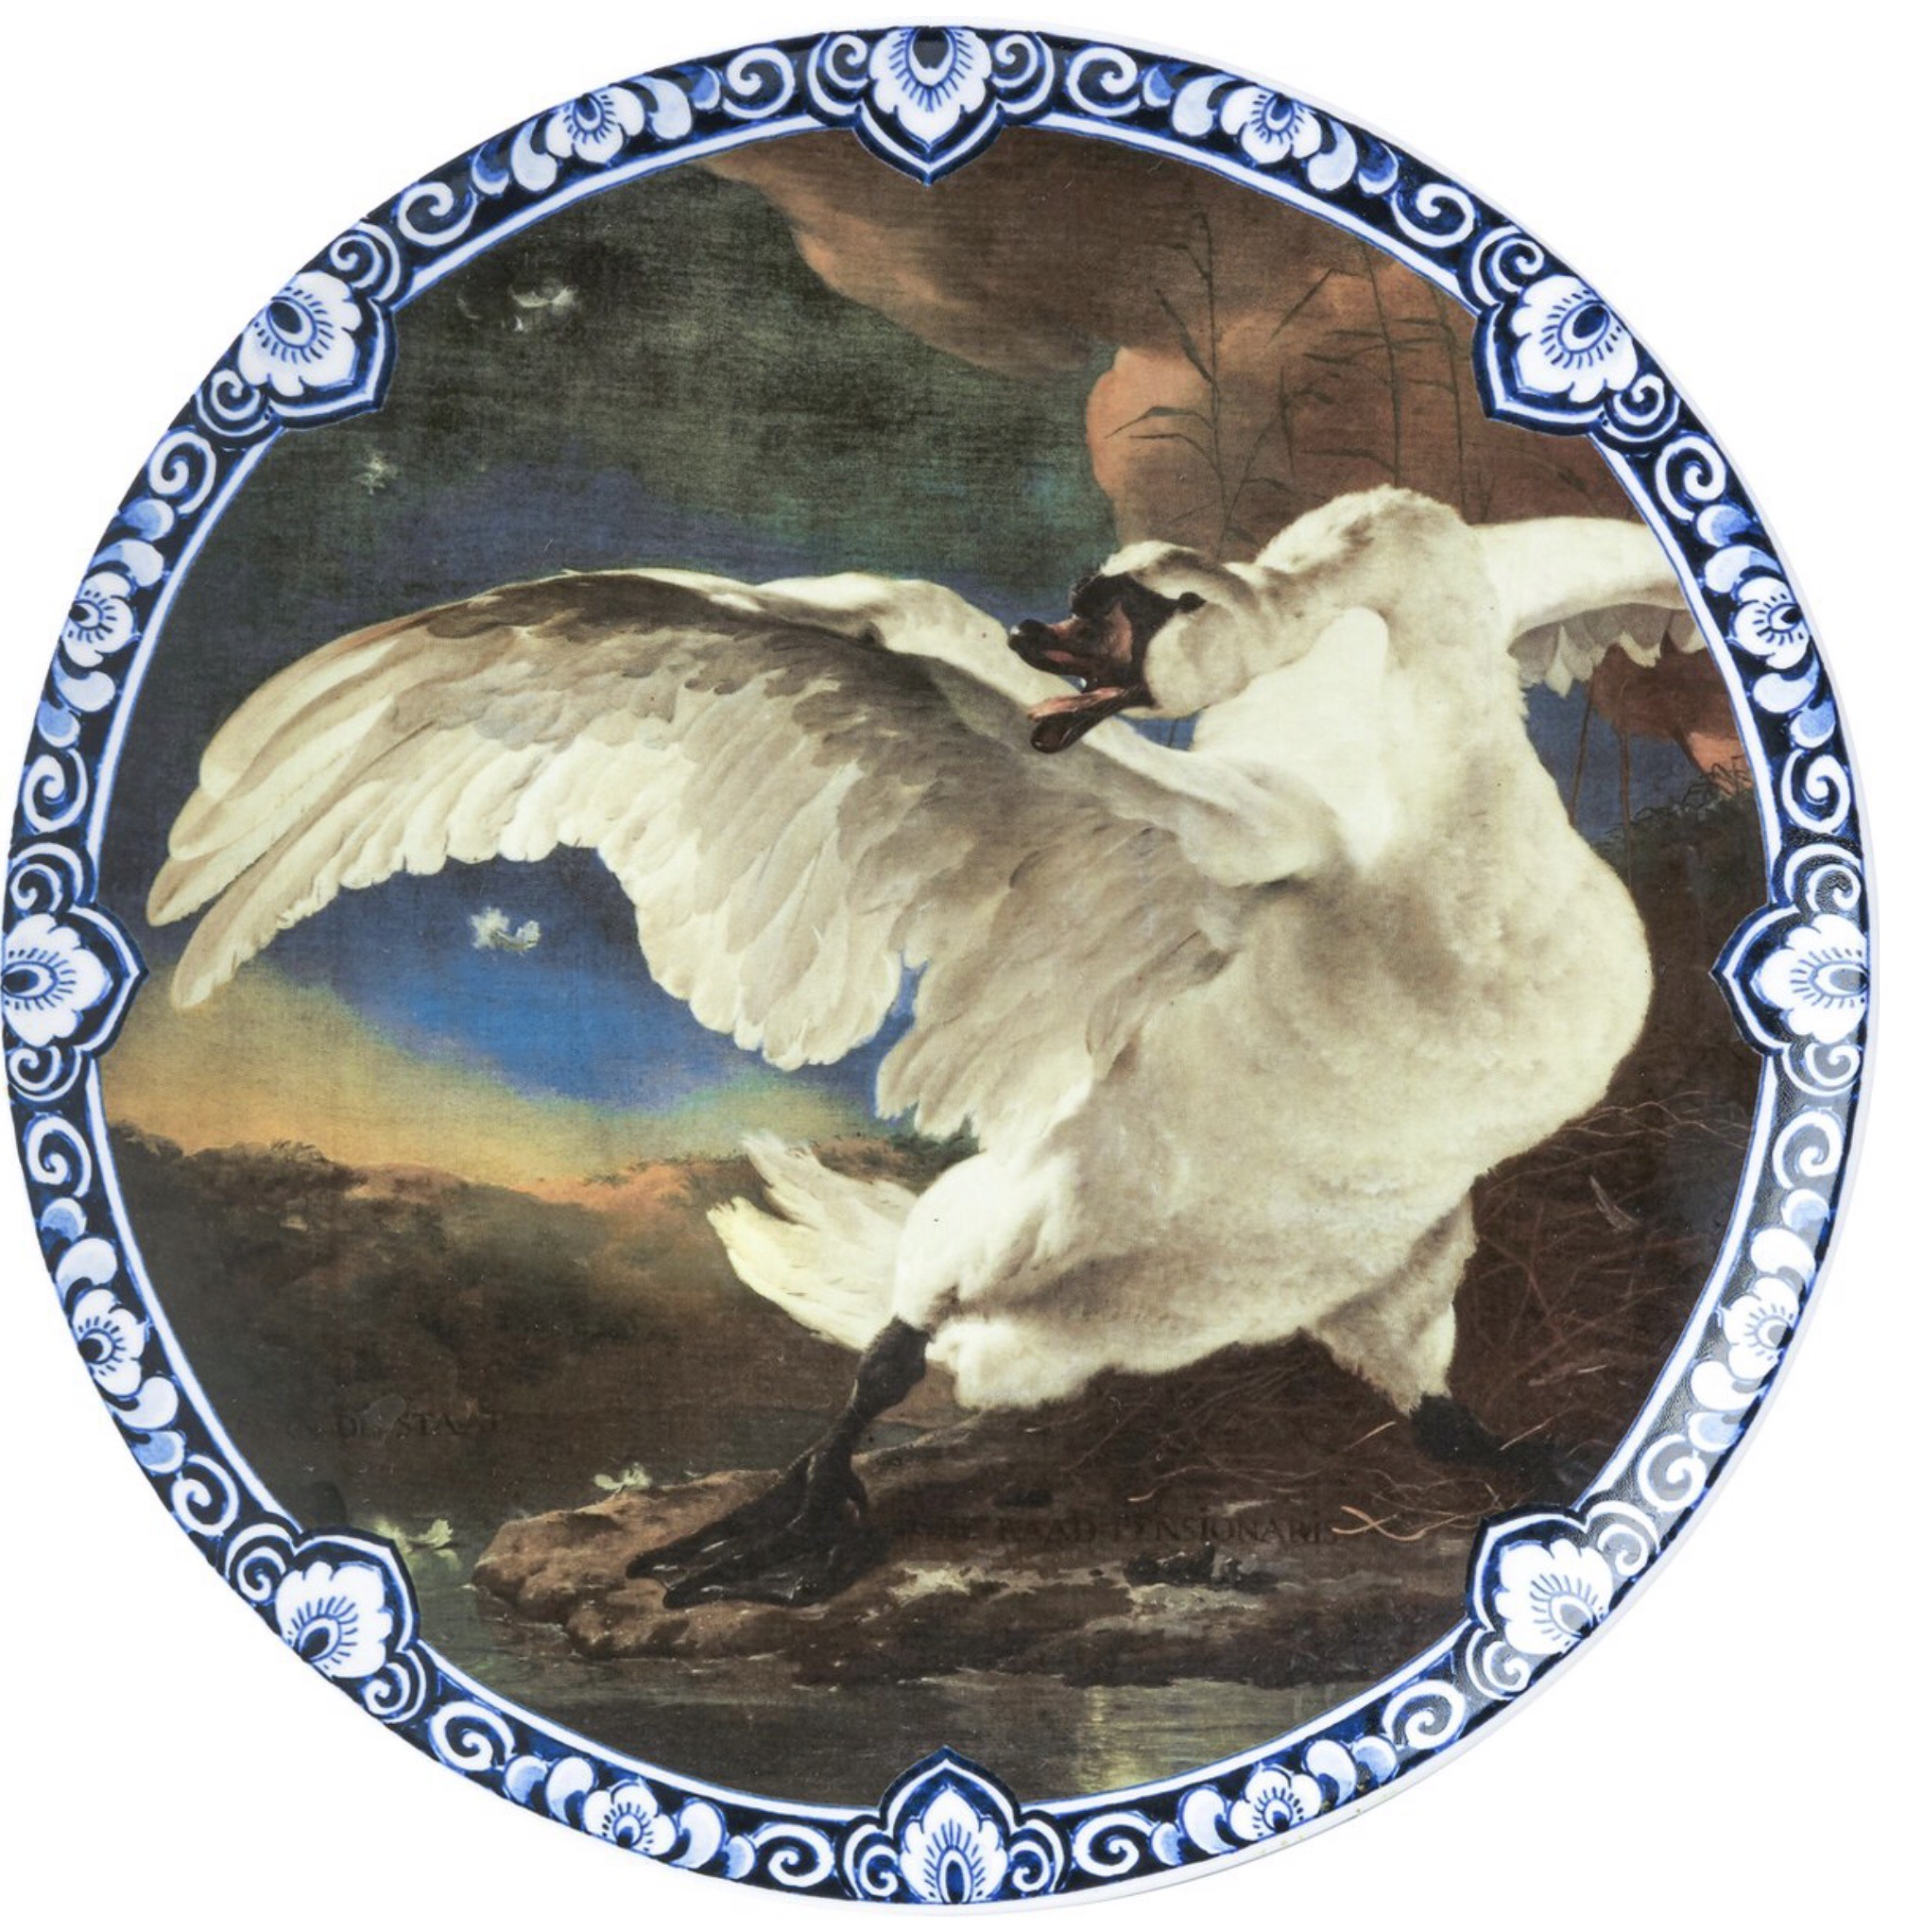 Wandbord bedreigde zwaan Heinen Delfts Blauw wand borden bij Angelart Kunst en Zo Hattem